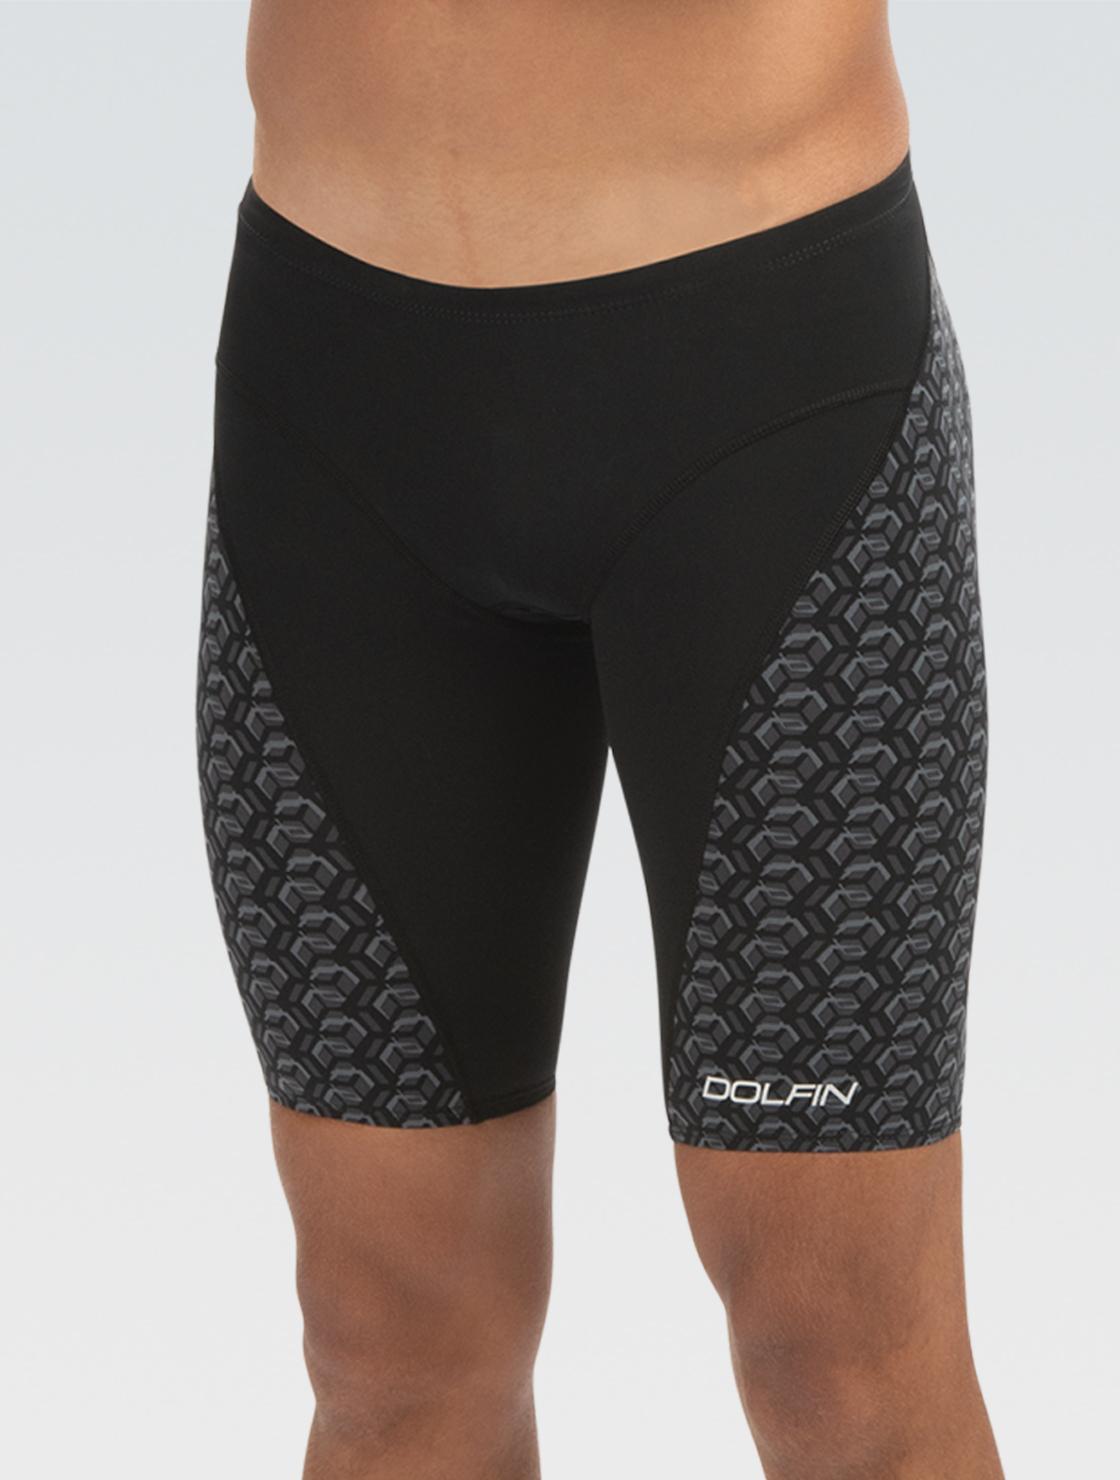 Dolfin First Strike black Knee Racing Swimsuit